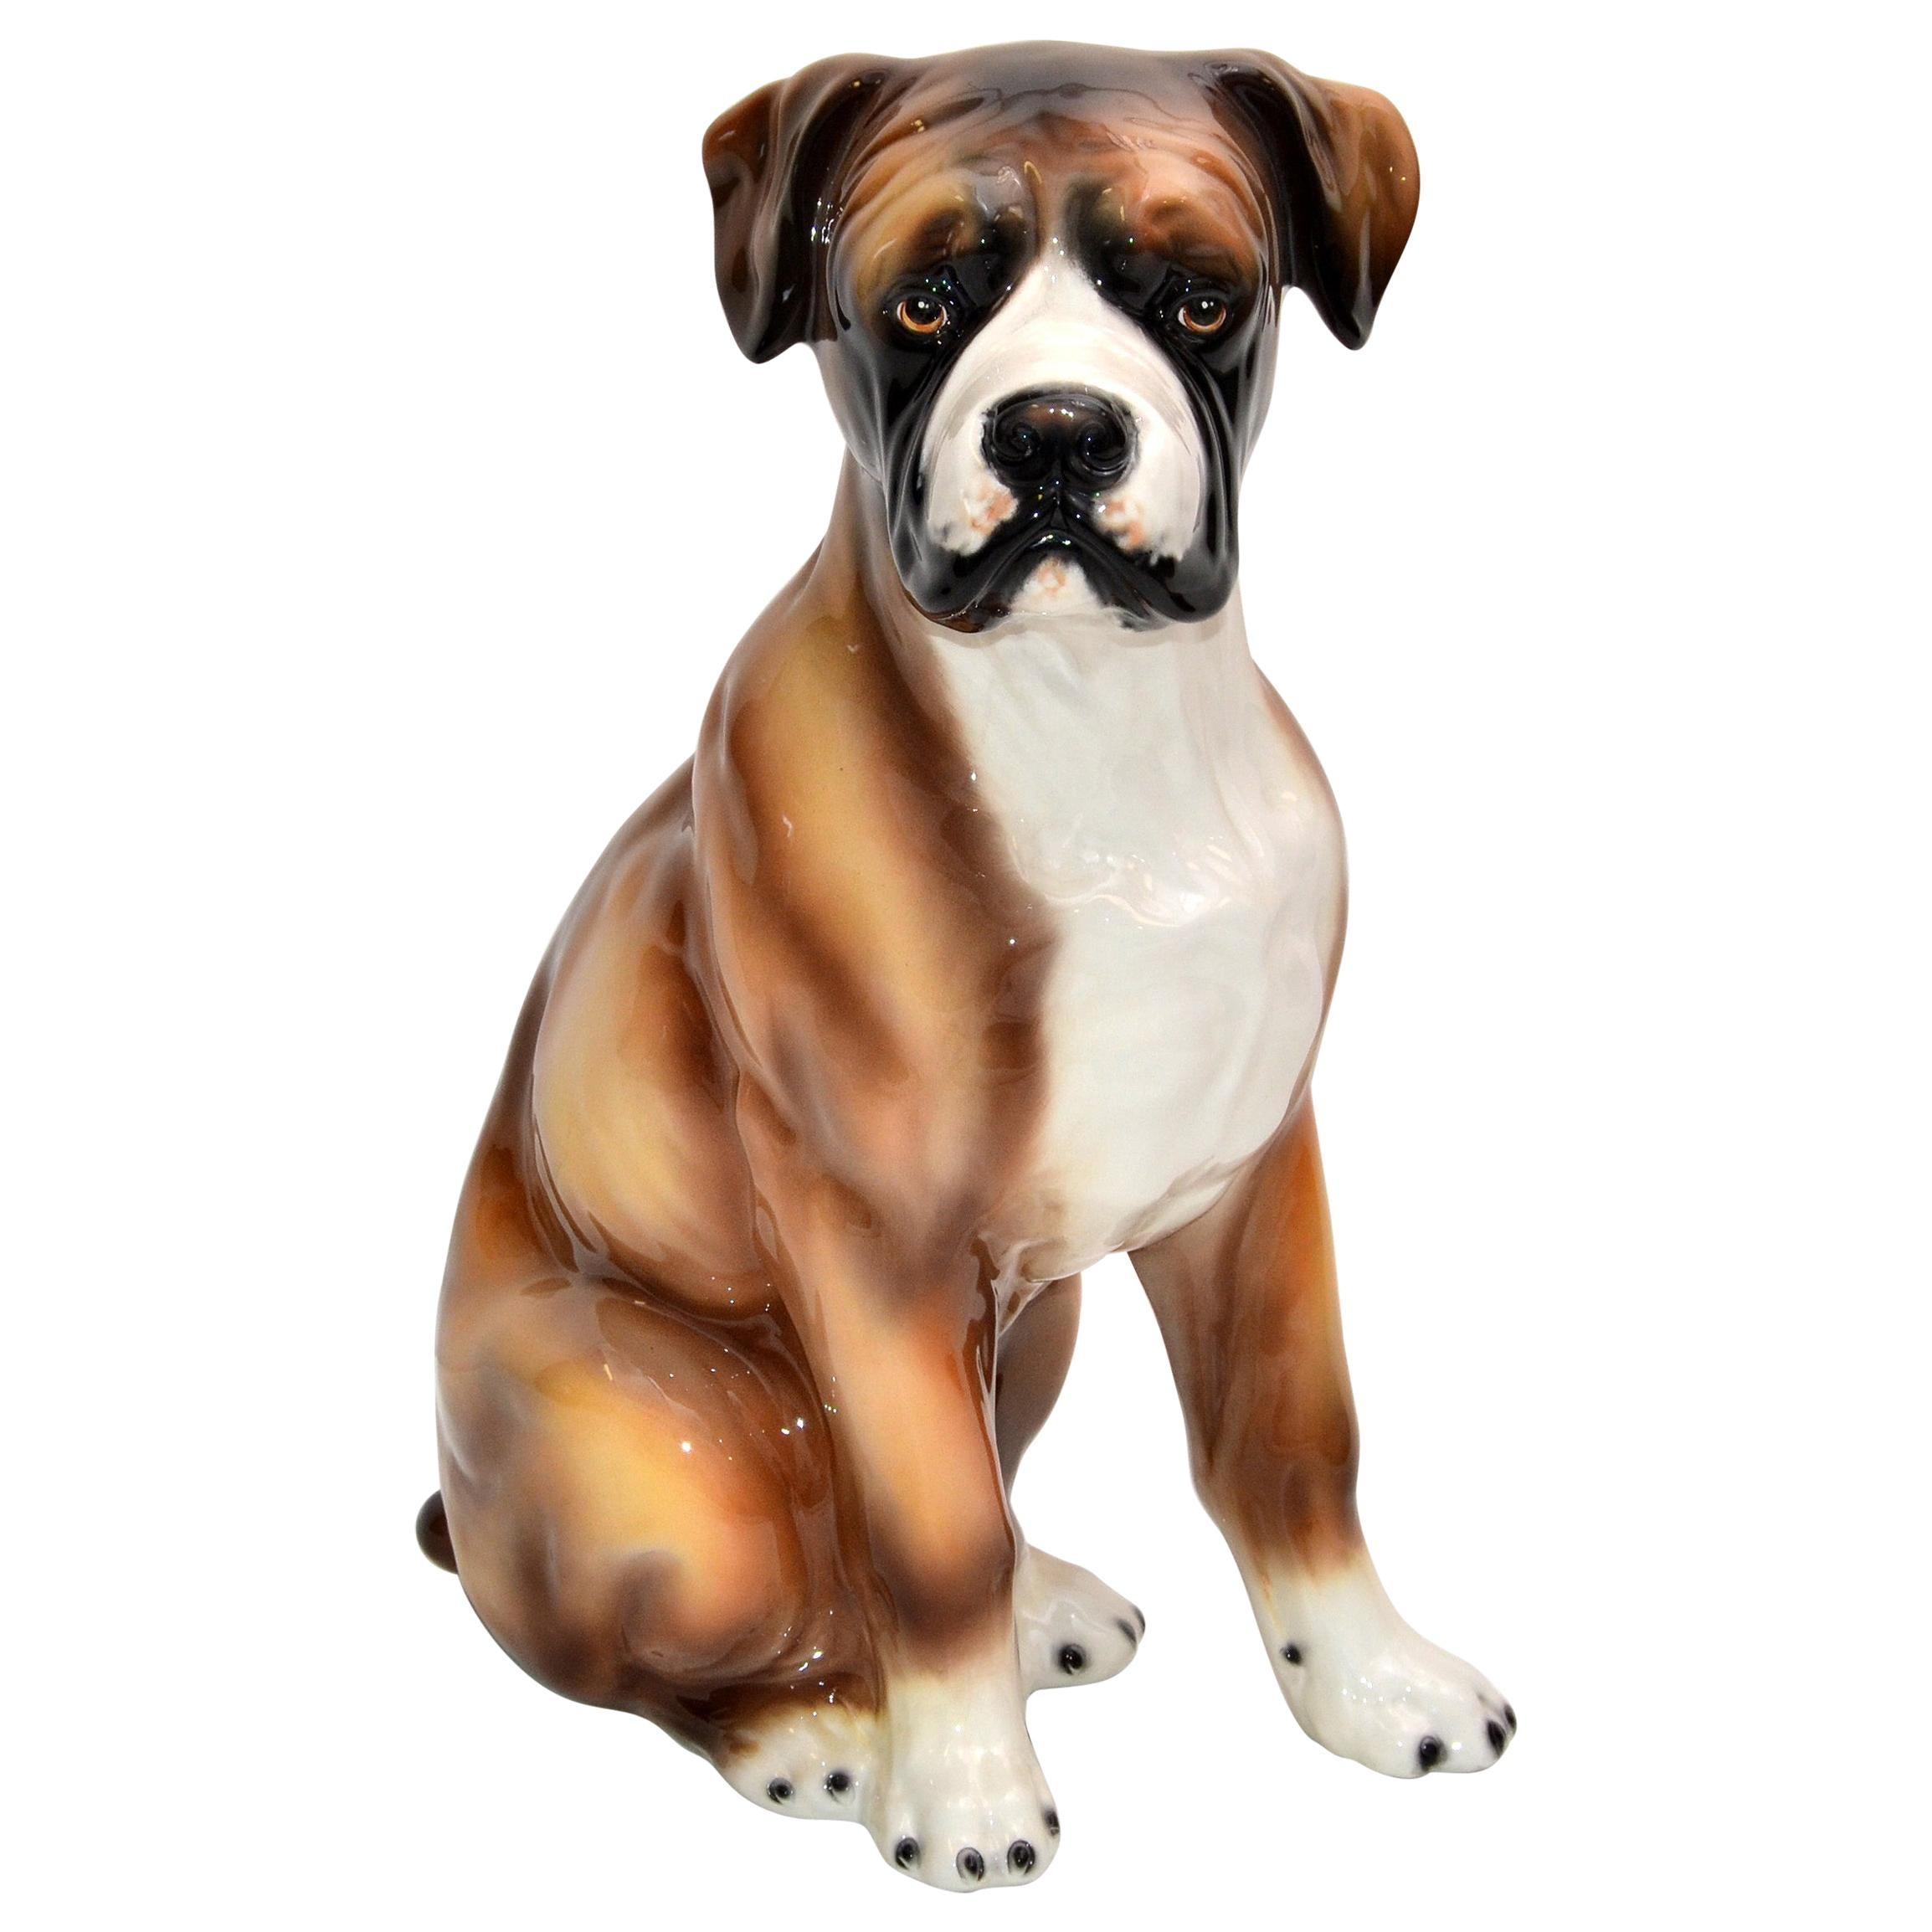 Italian Hand Painted & Ceramic Life-sized Boxer Dog Statue, Animal Sculpture